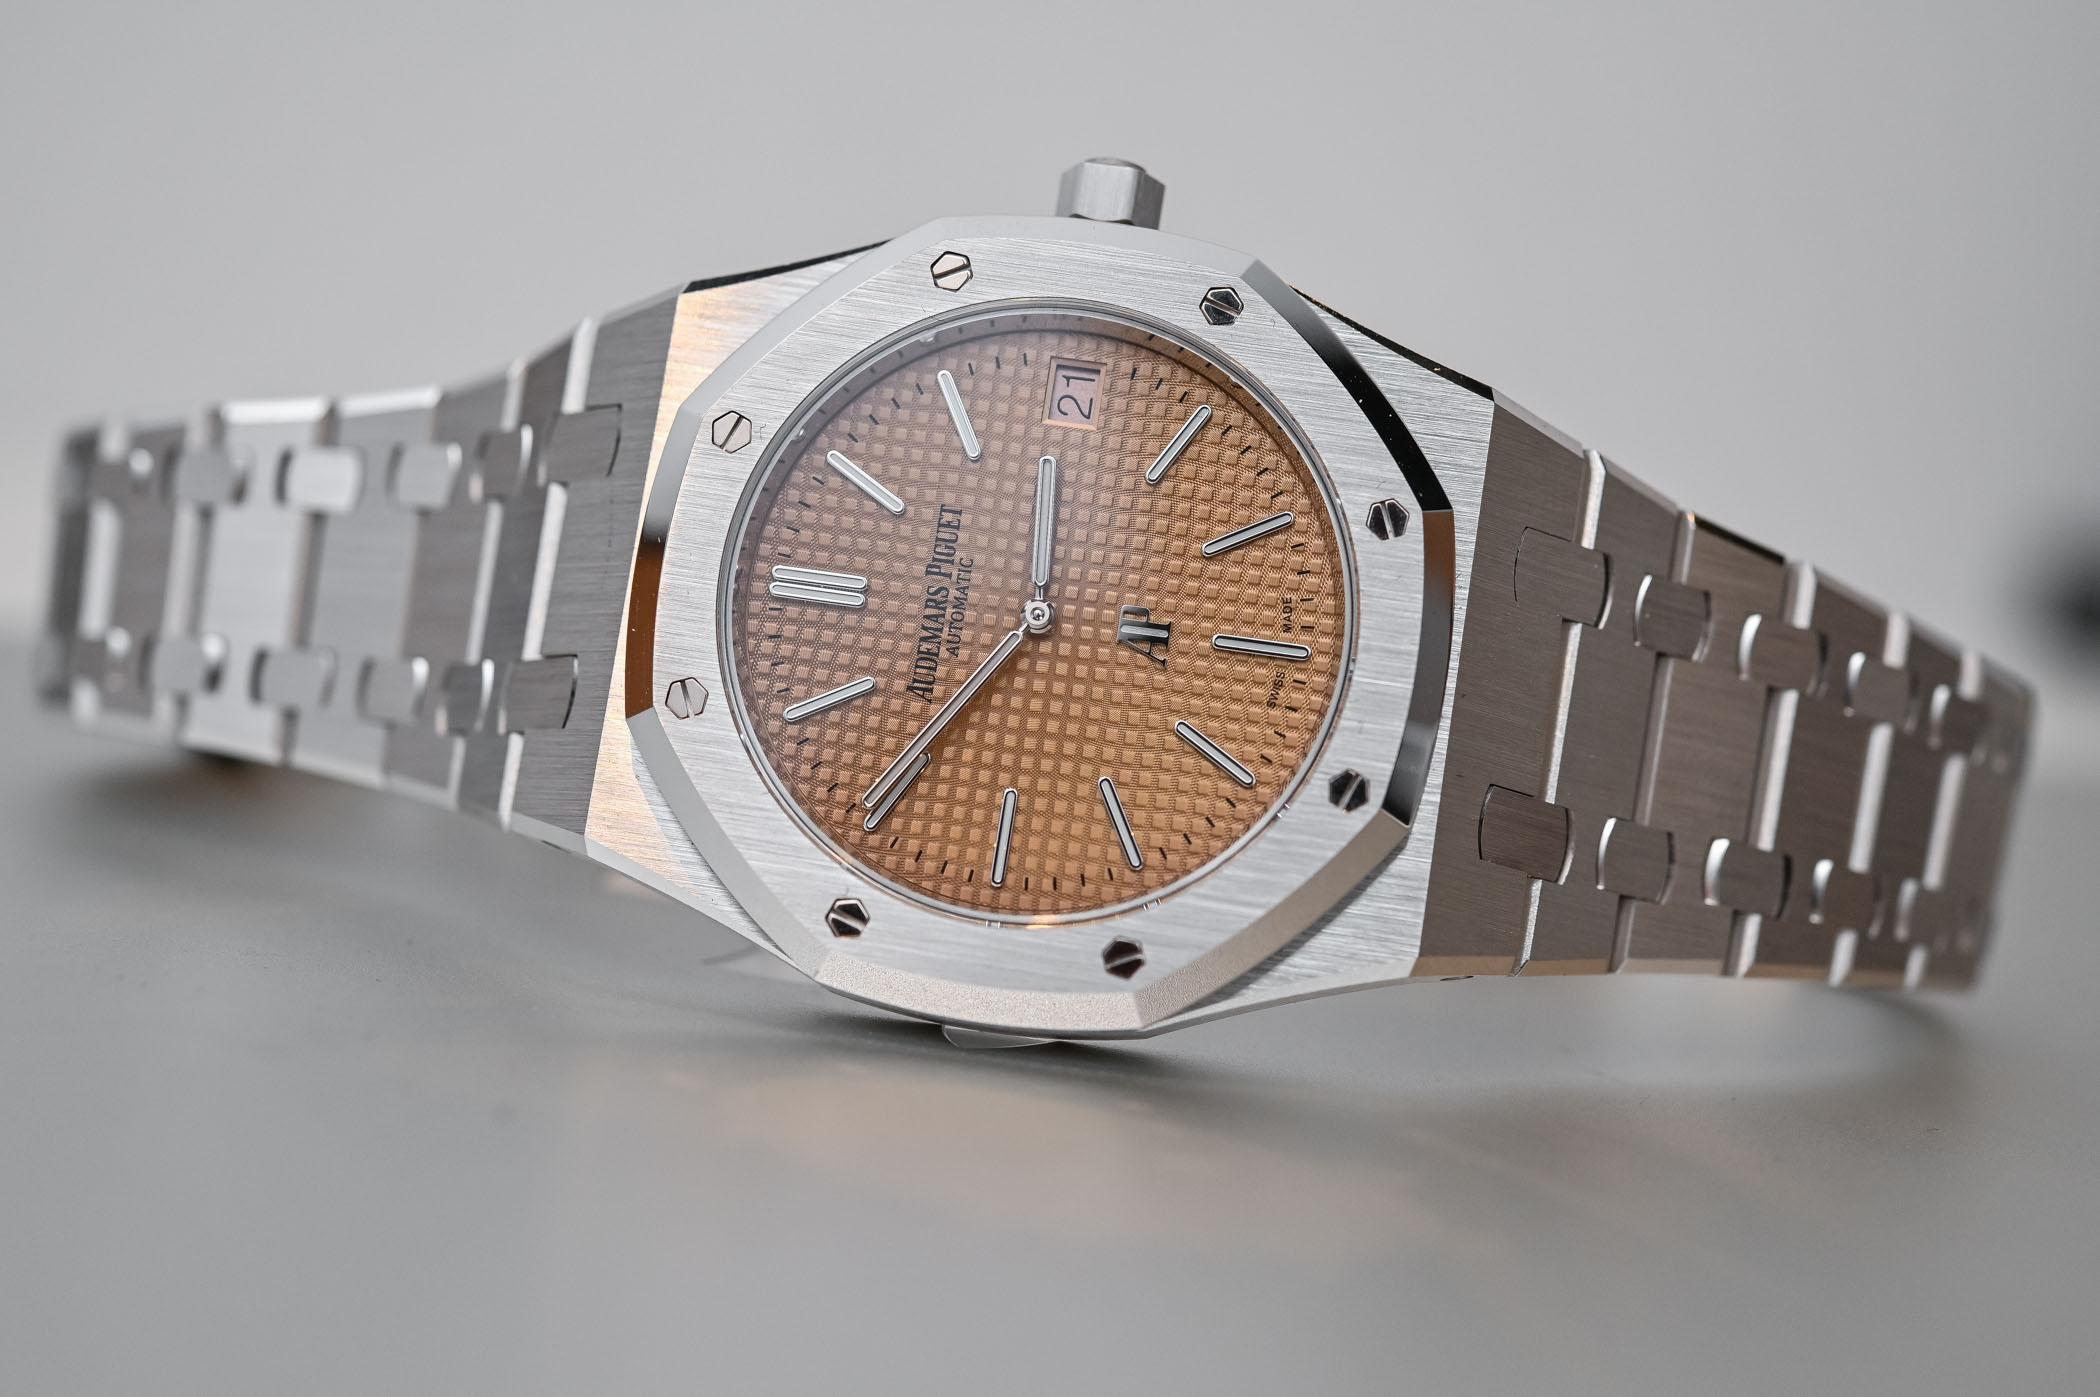 Audemars Piguet Royal Oak Jumbo Extra-Thin salmon dial white gold 15202BC - 2